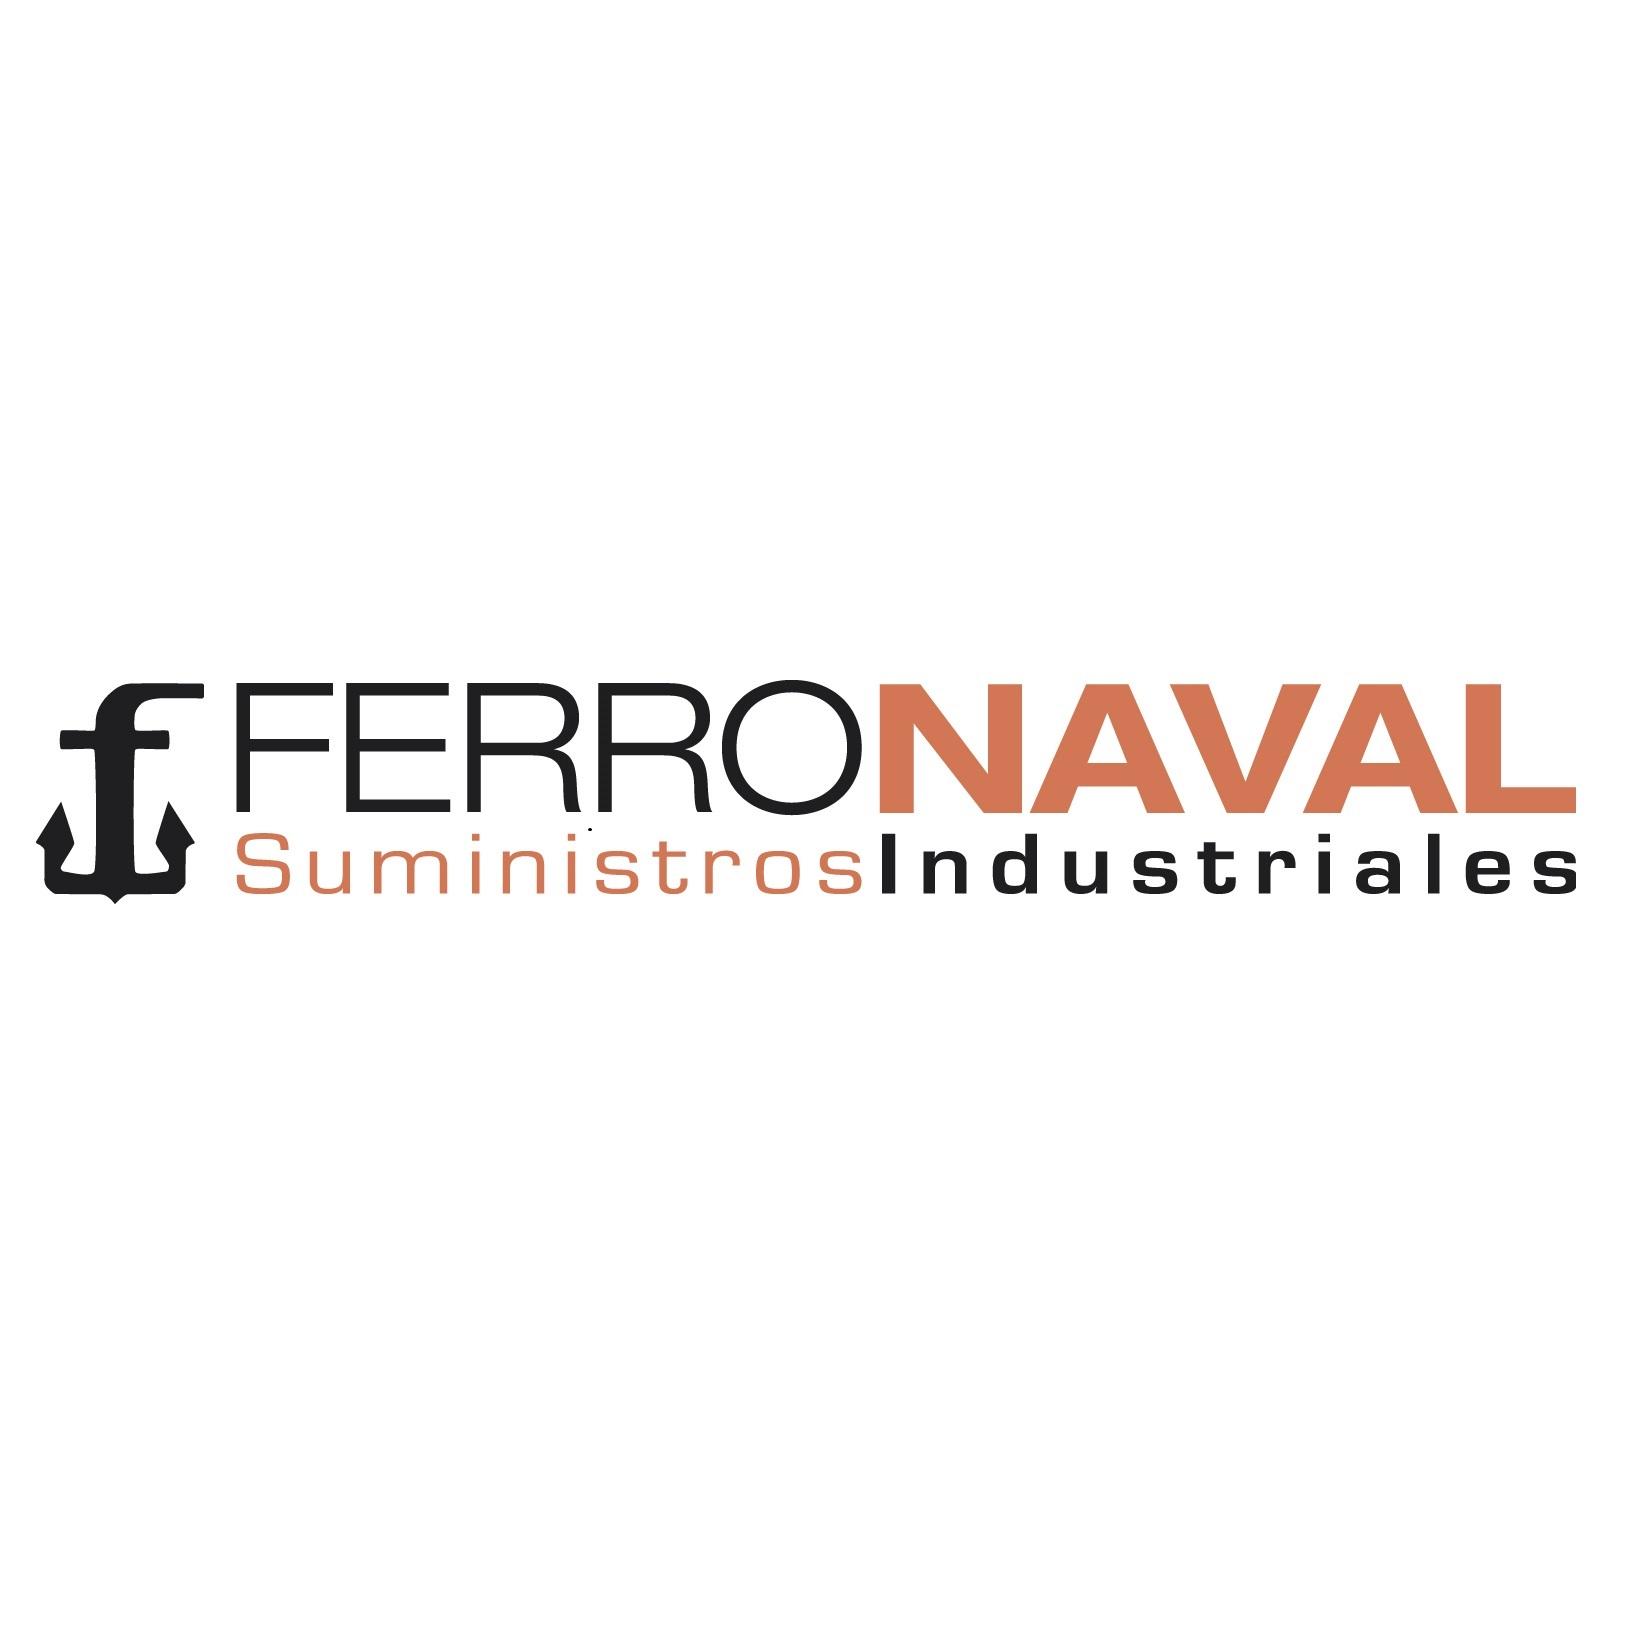 FERRONAVAL